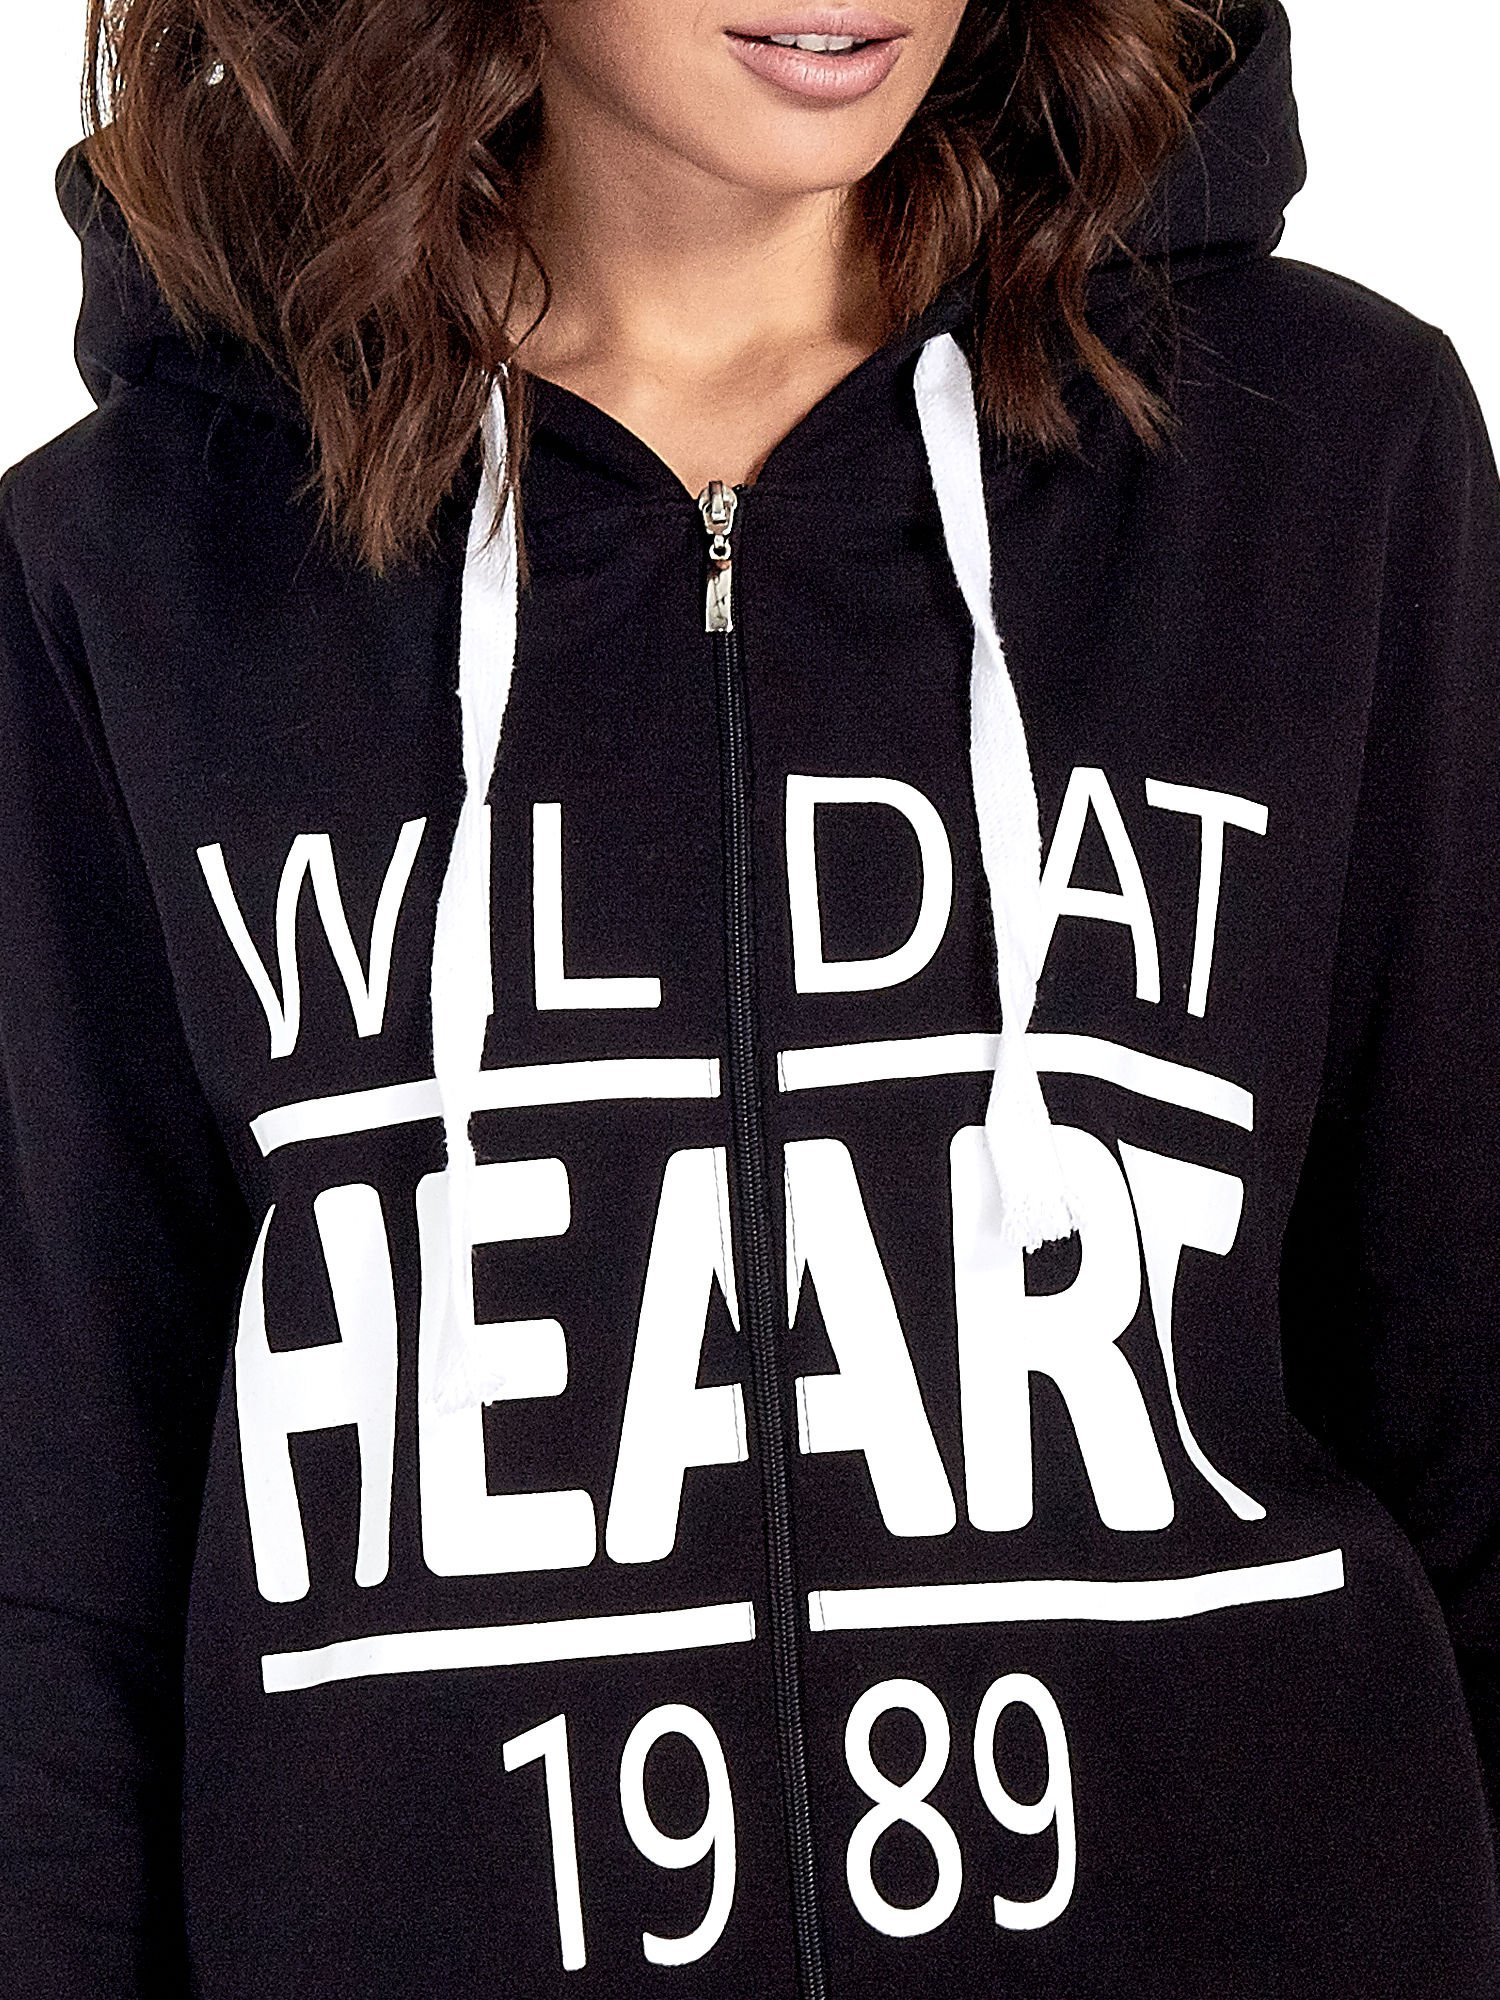 Czarna damska bluza z kapturem i napisem WILD AT HEART 1989                                  zdj.                                  6